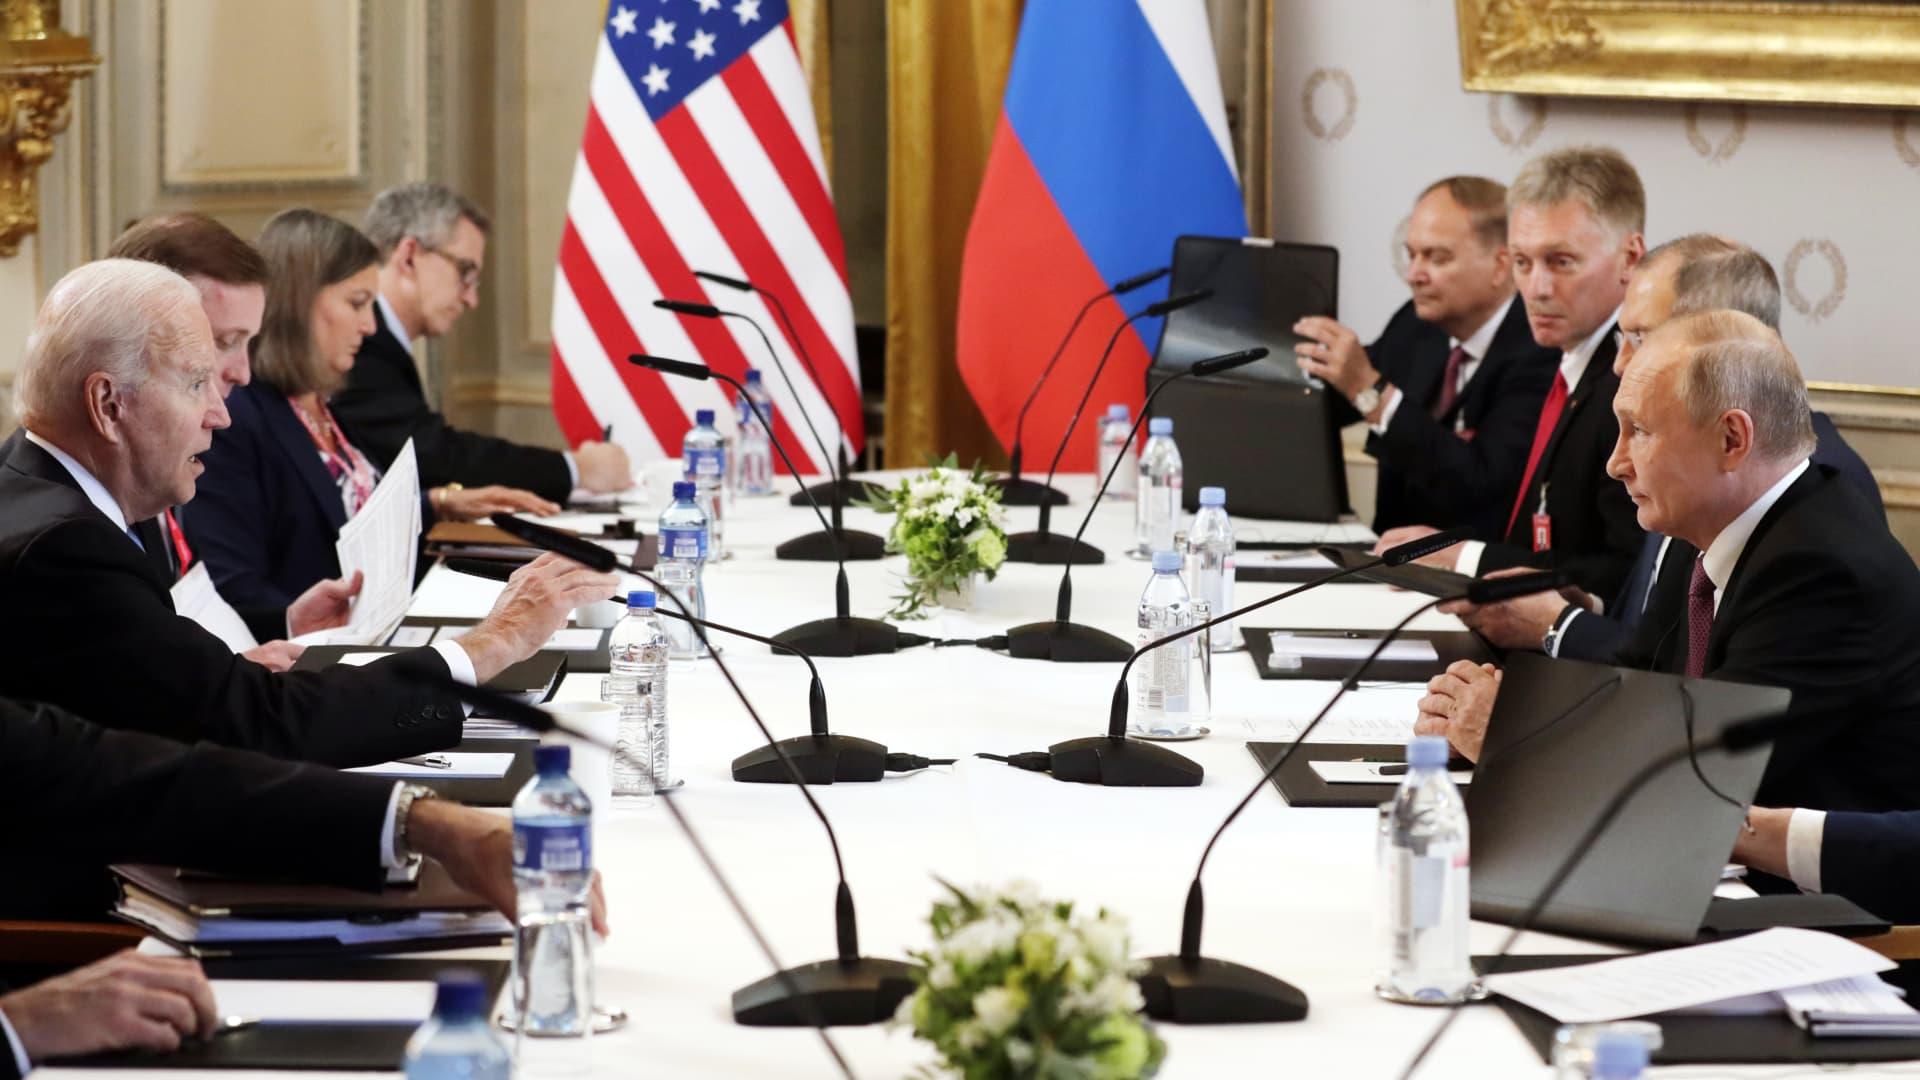 US President Joe Biden (L) and Russia's President Vladimir Putin (R) meet for talks at the Villa La Grange.